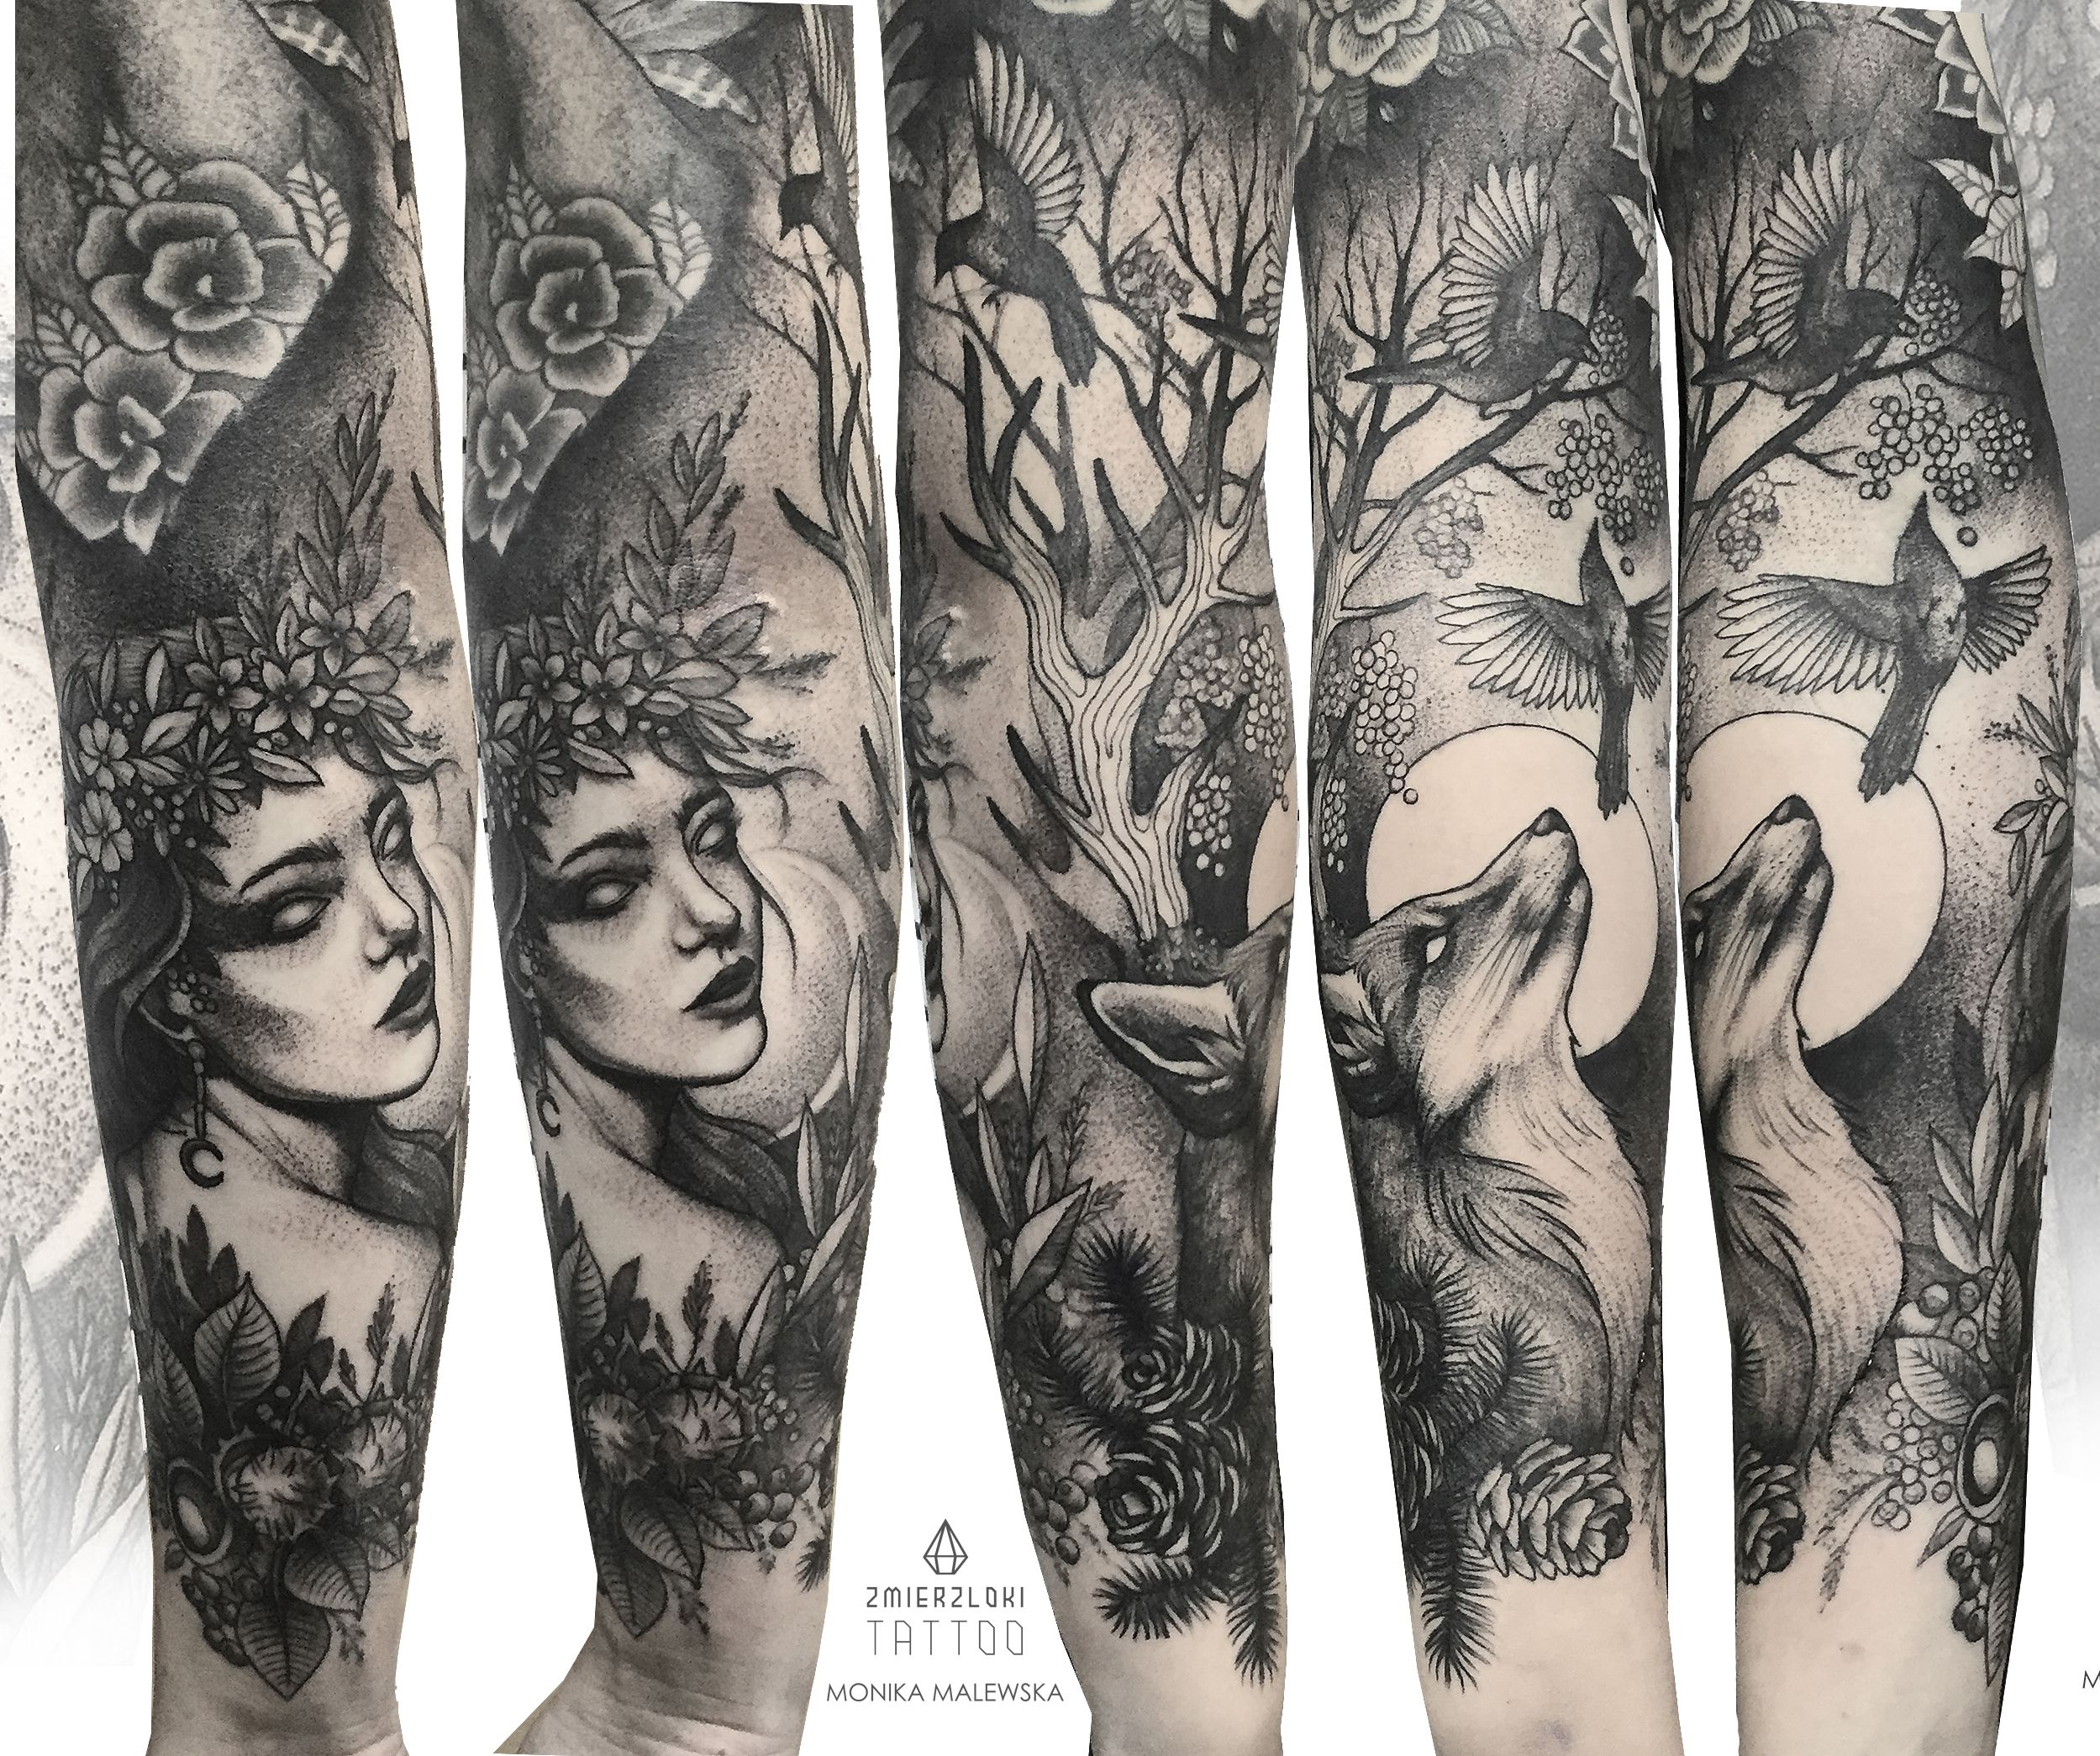 Nature Tattoos On Pinterest: Mother Nature Tattoos